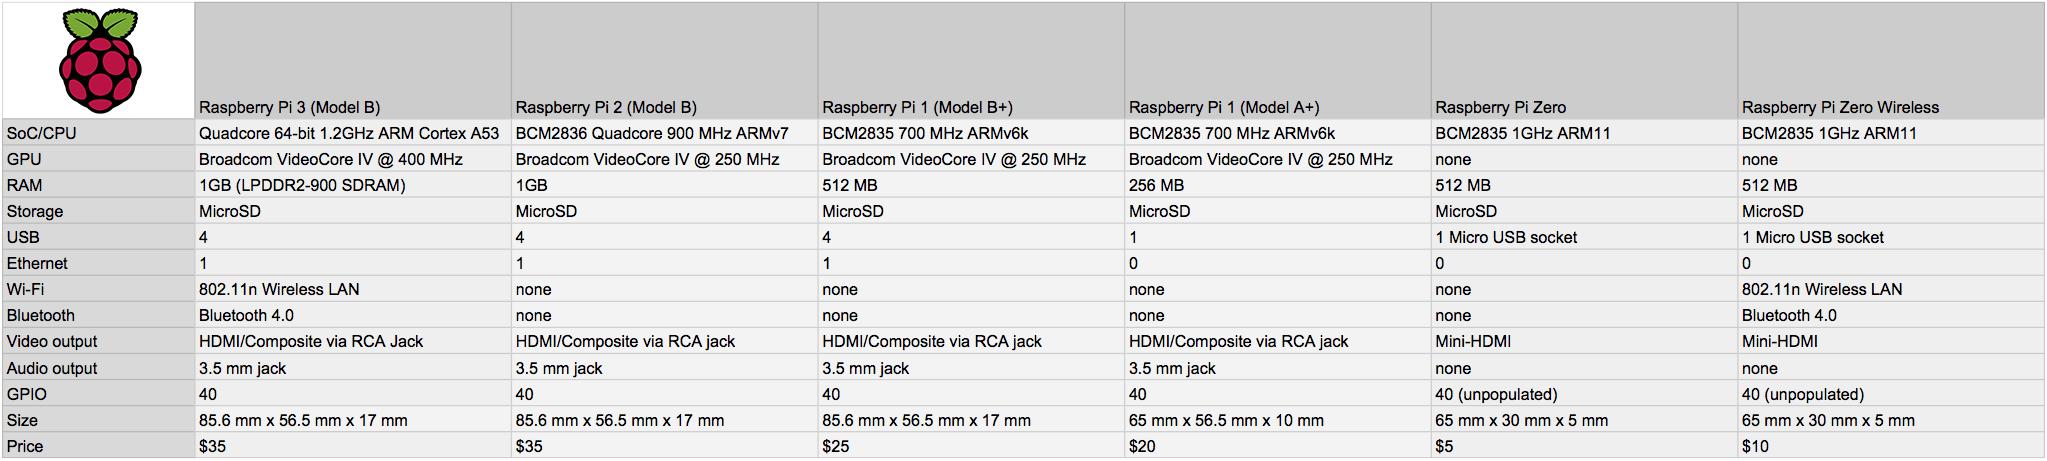 спецификация на все имеющиеся модели raspberry pi